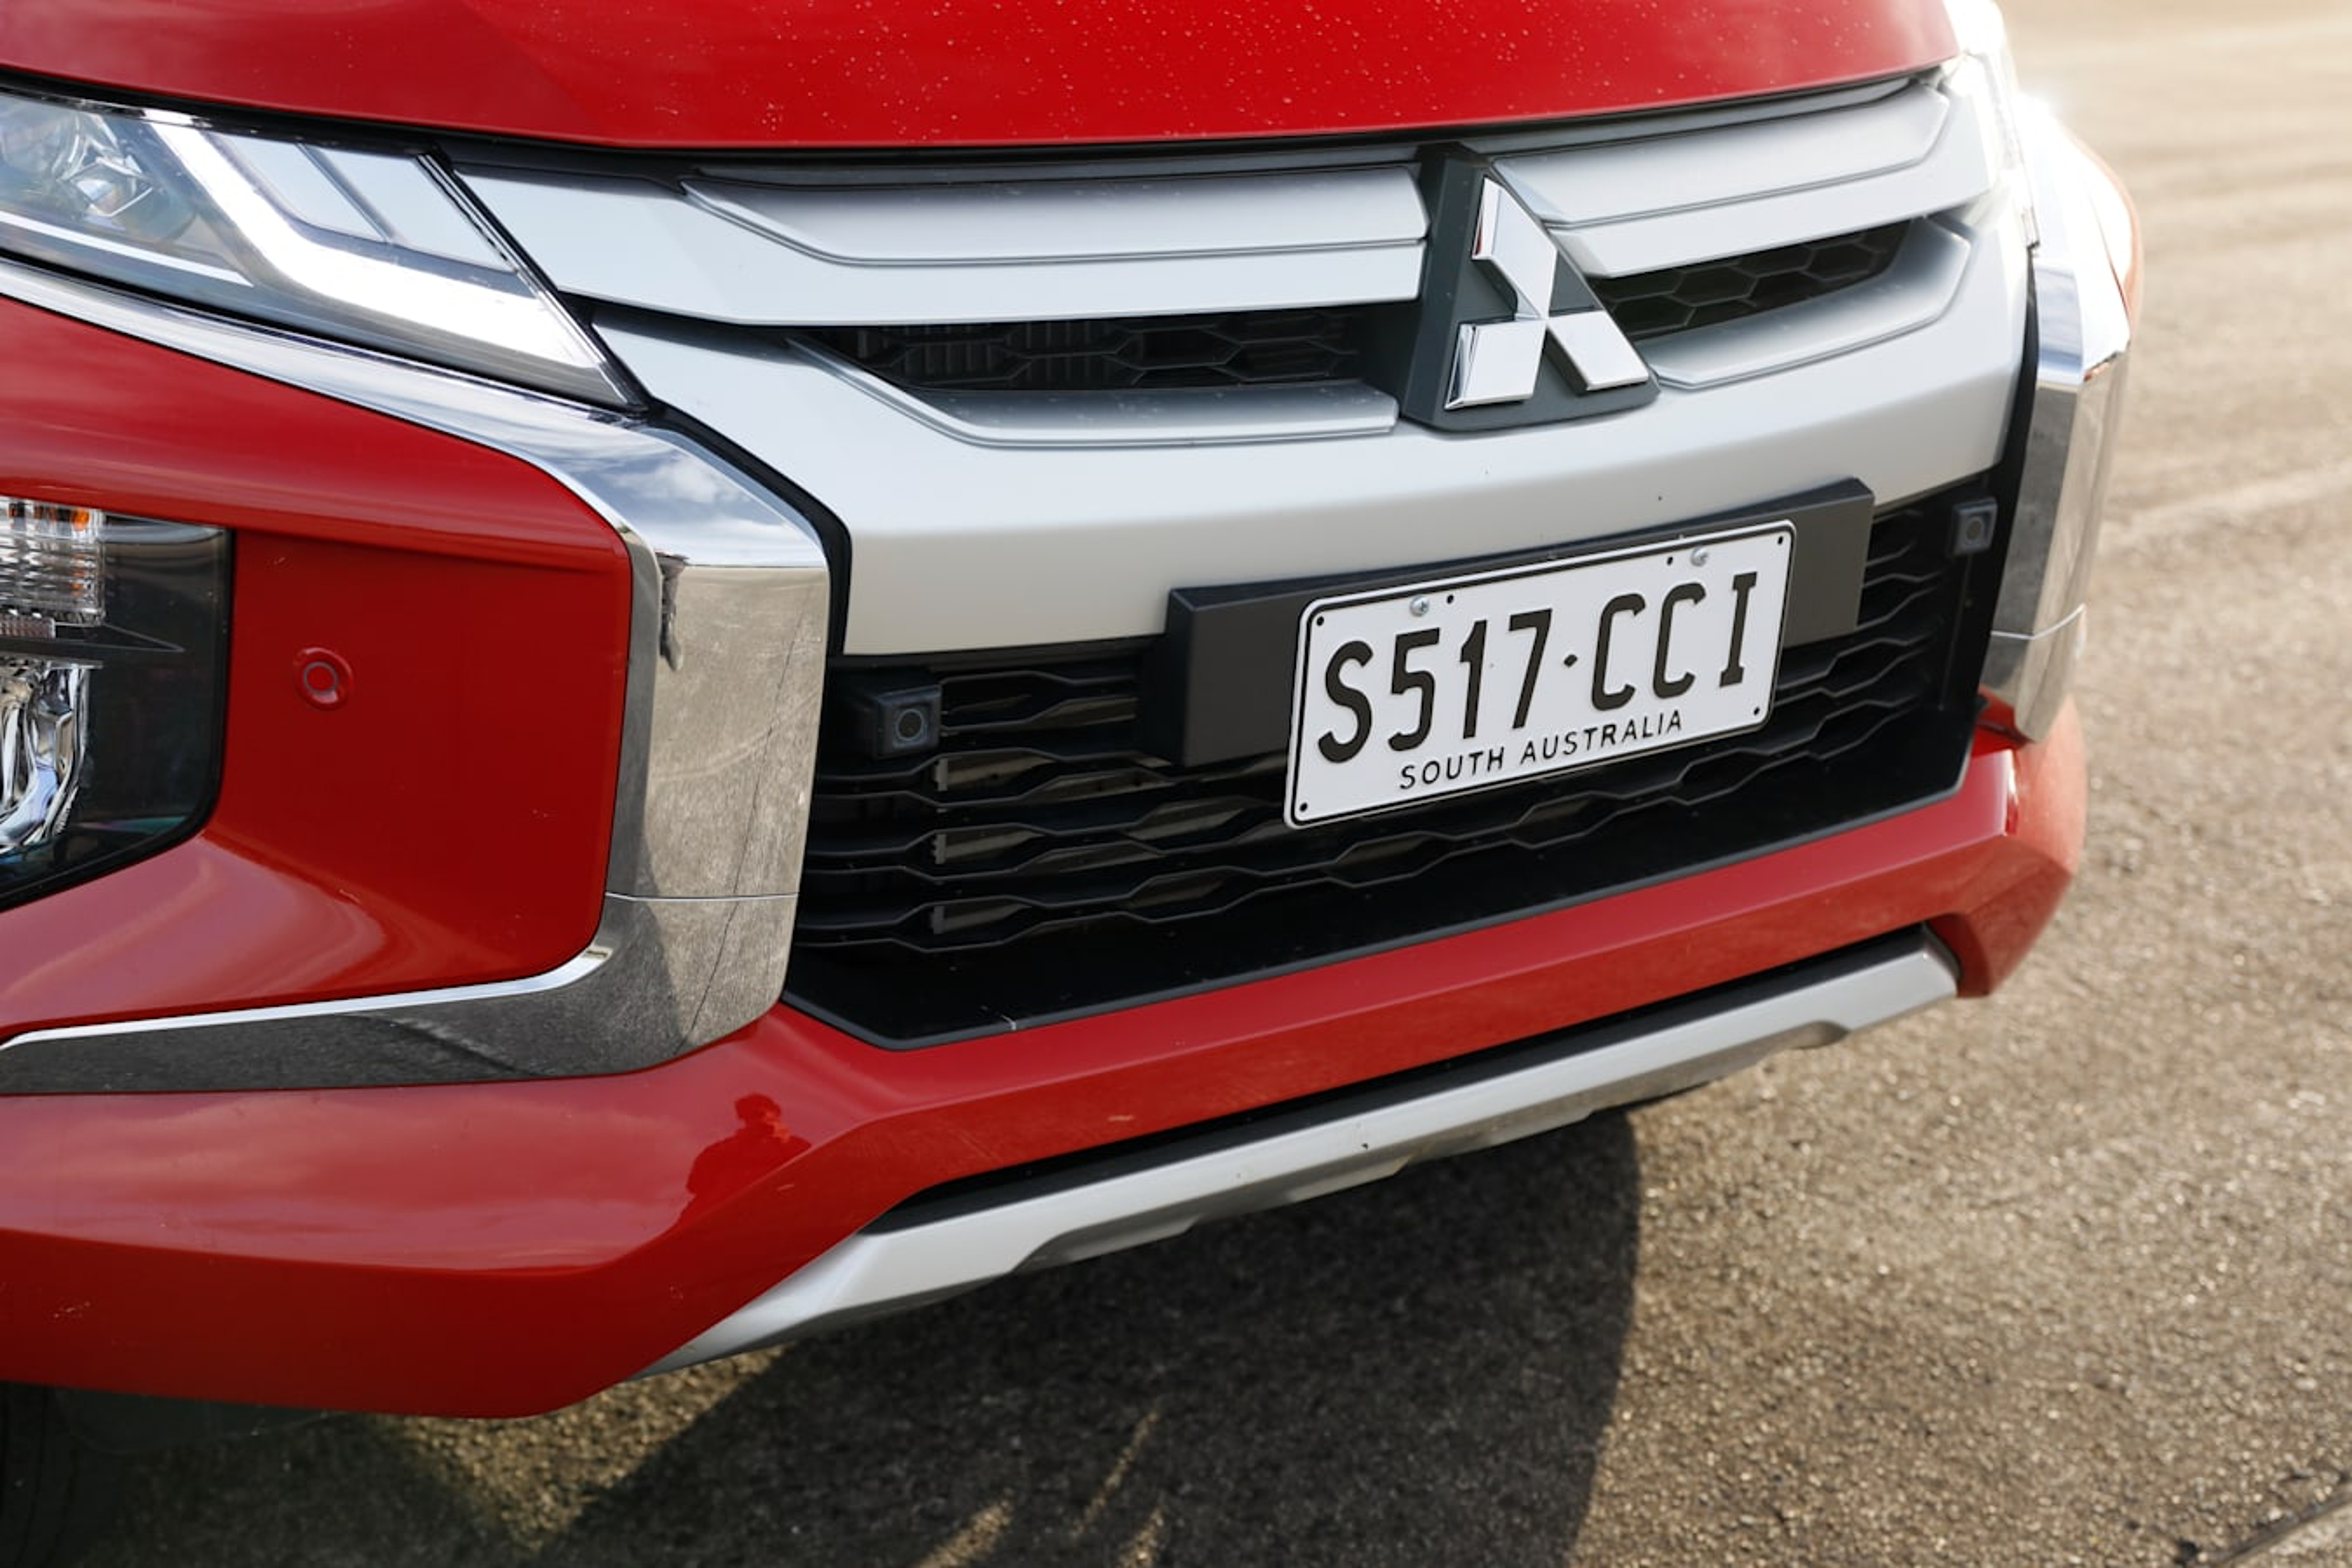 4 X 4 Australia Comparisons 2021 May 21 Mitsubishi Triton GLS Front Grille